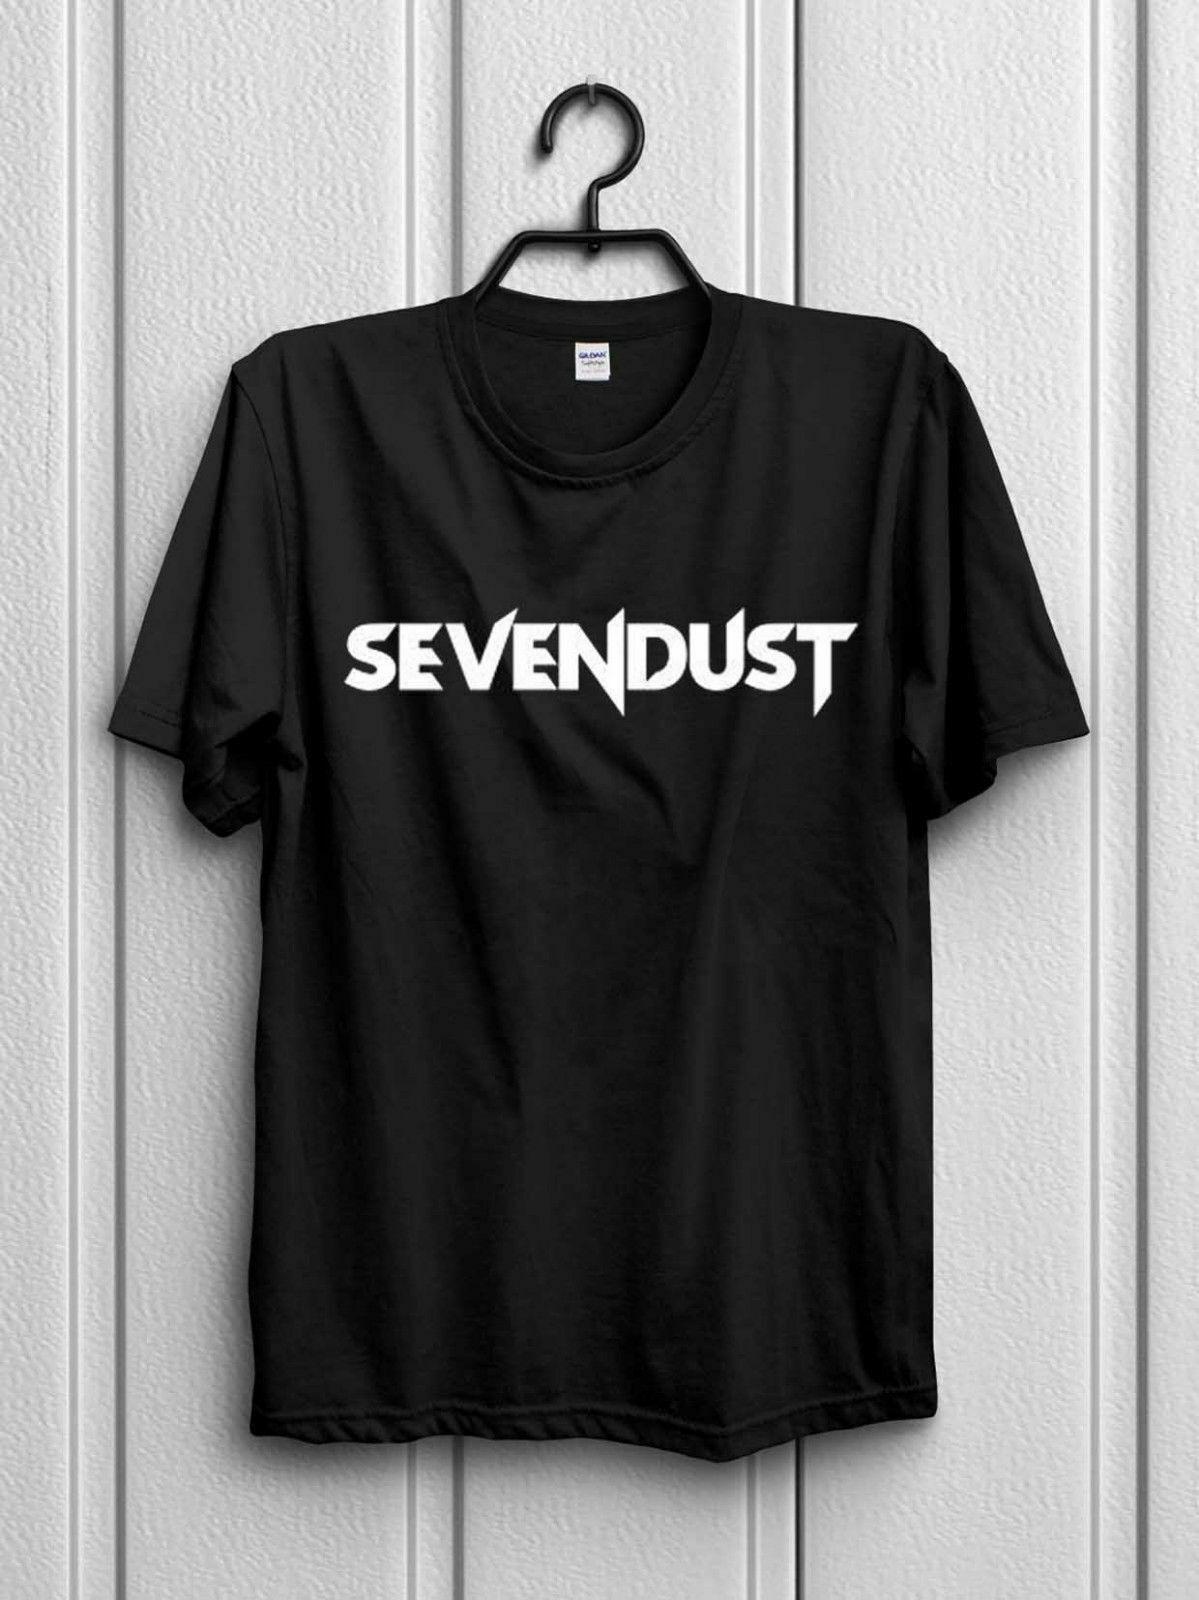 SEVENDUST LOGO Tshirt Black New Men/'s T-Shirt Size S to 3XL